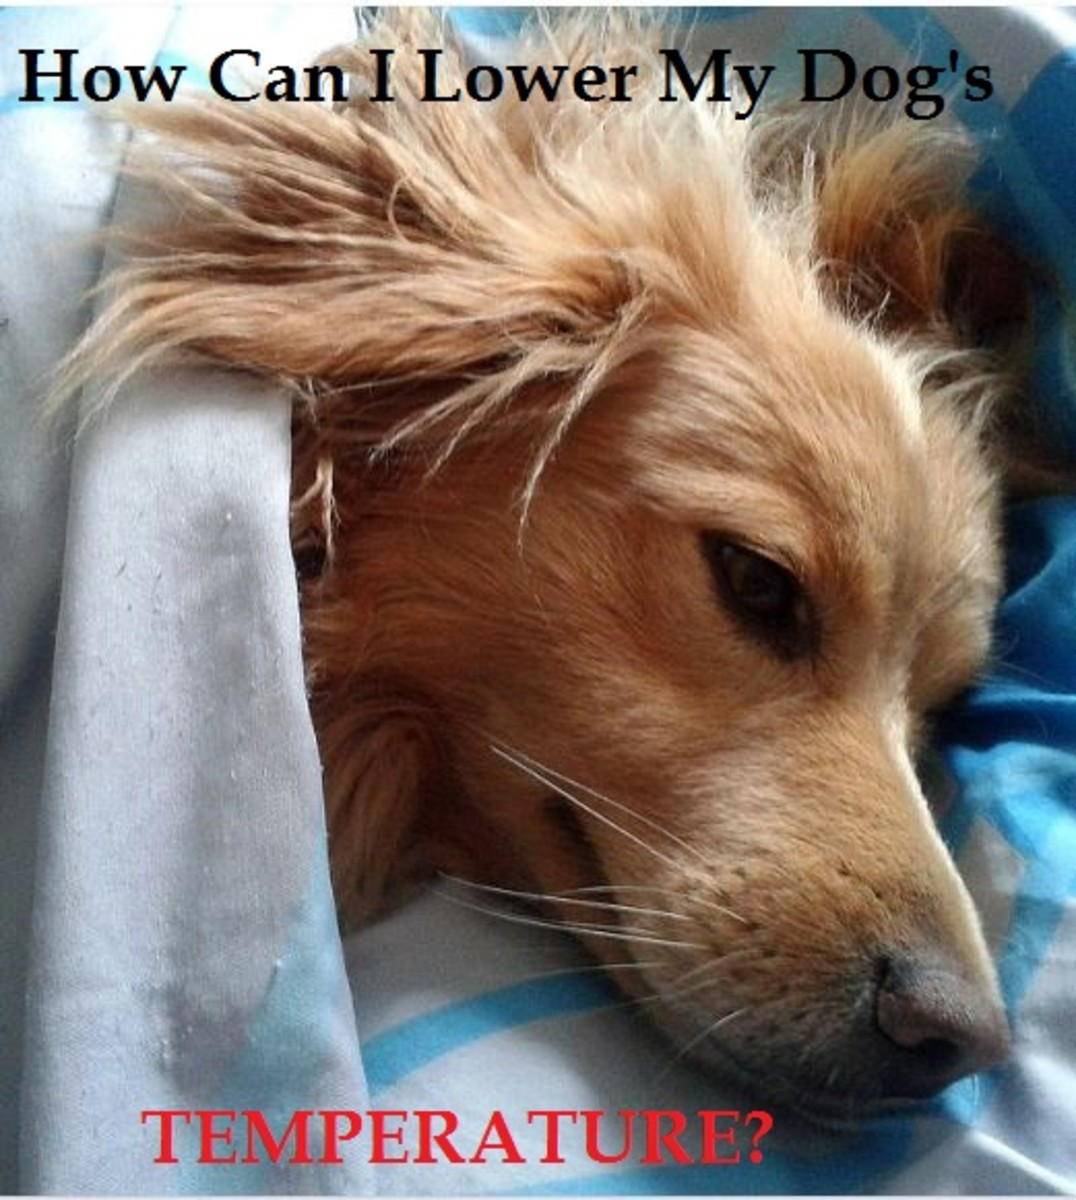 bring dog temperature down